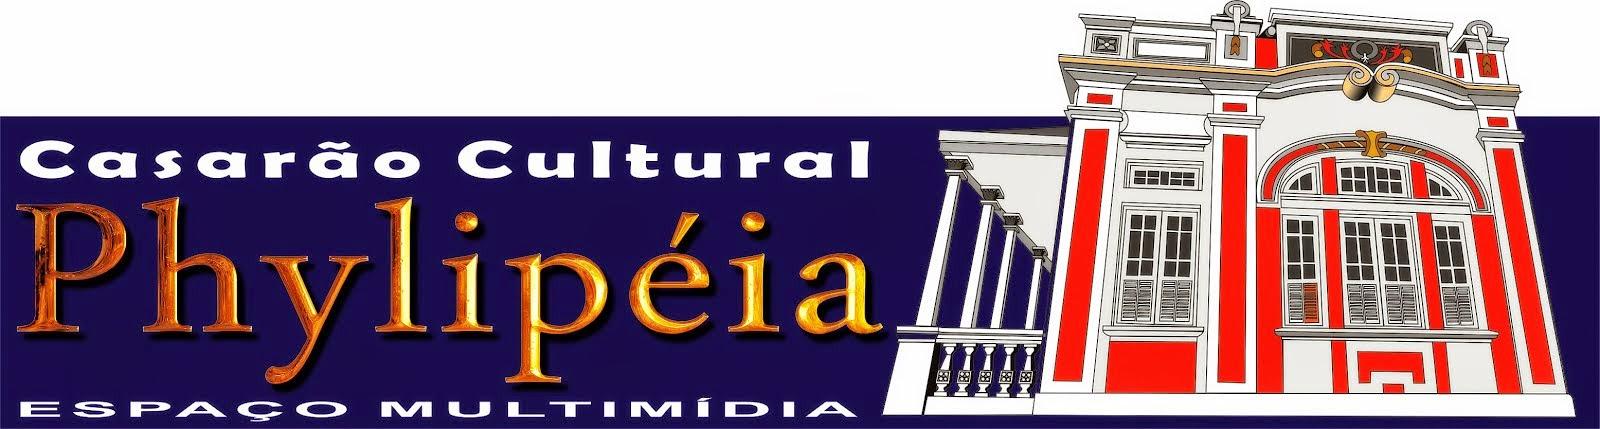 CASARÃO CULTURAL PHYLIPÉIA